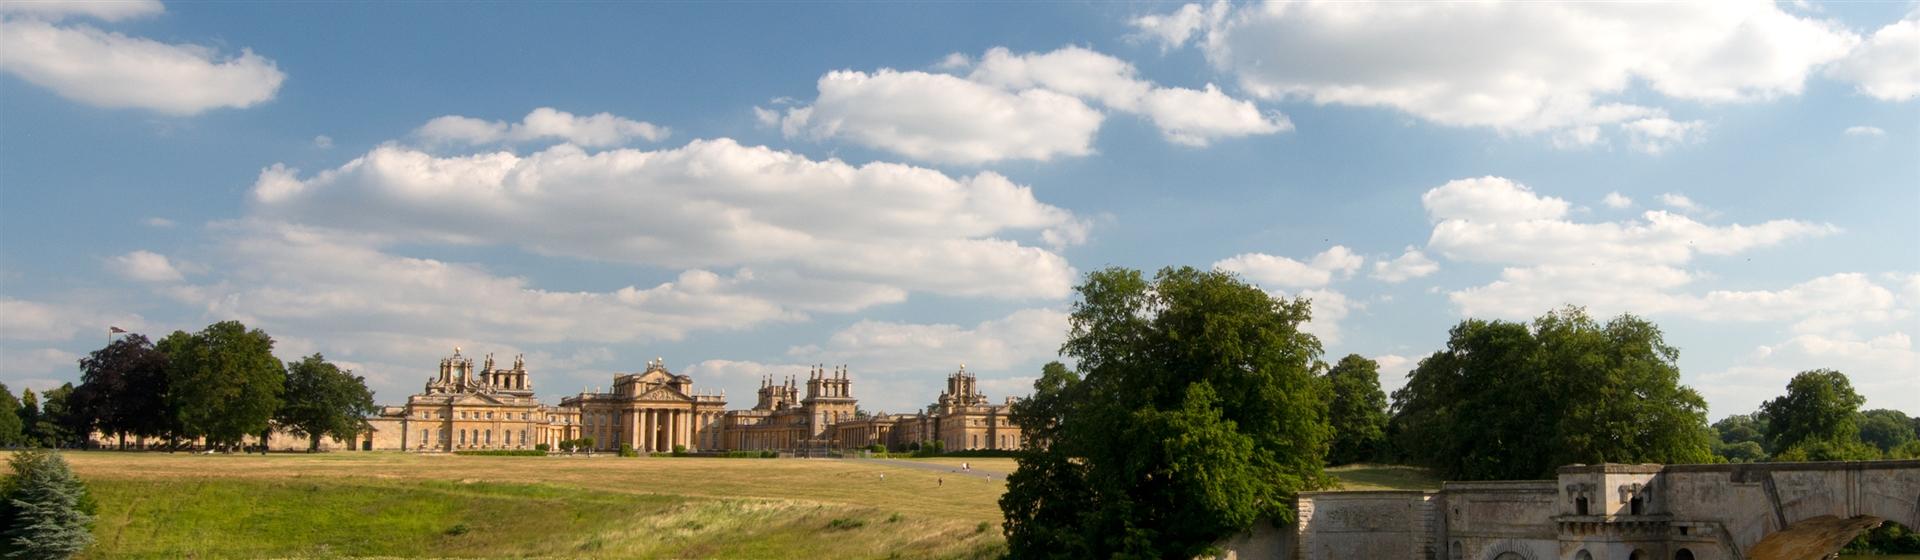 Historic Houses & Castles